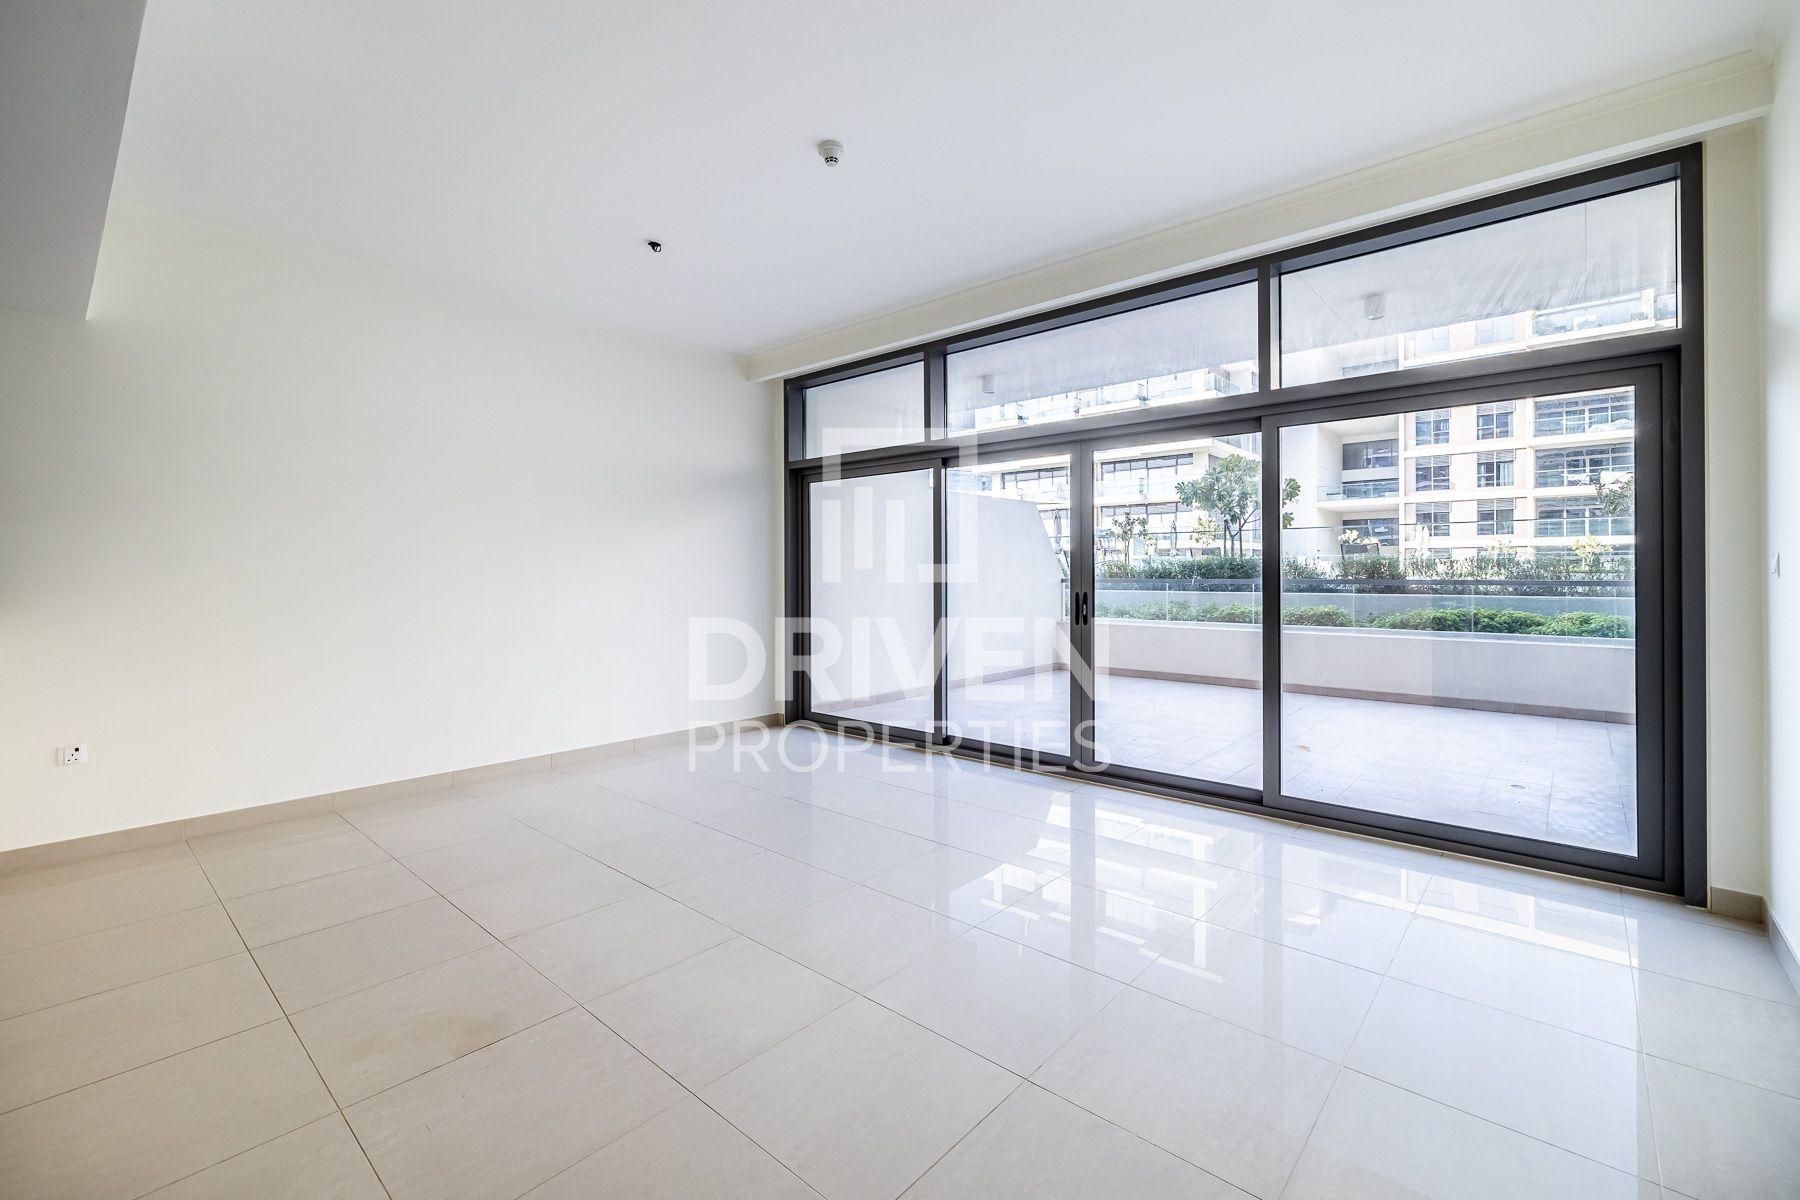 Apartment for Sale in Mulberry - Dubai Hills Estate